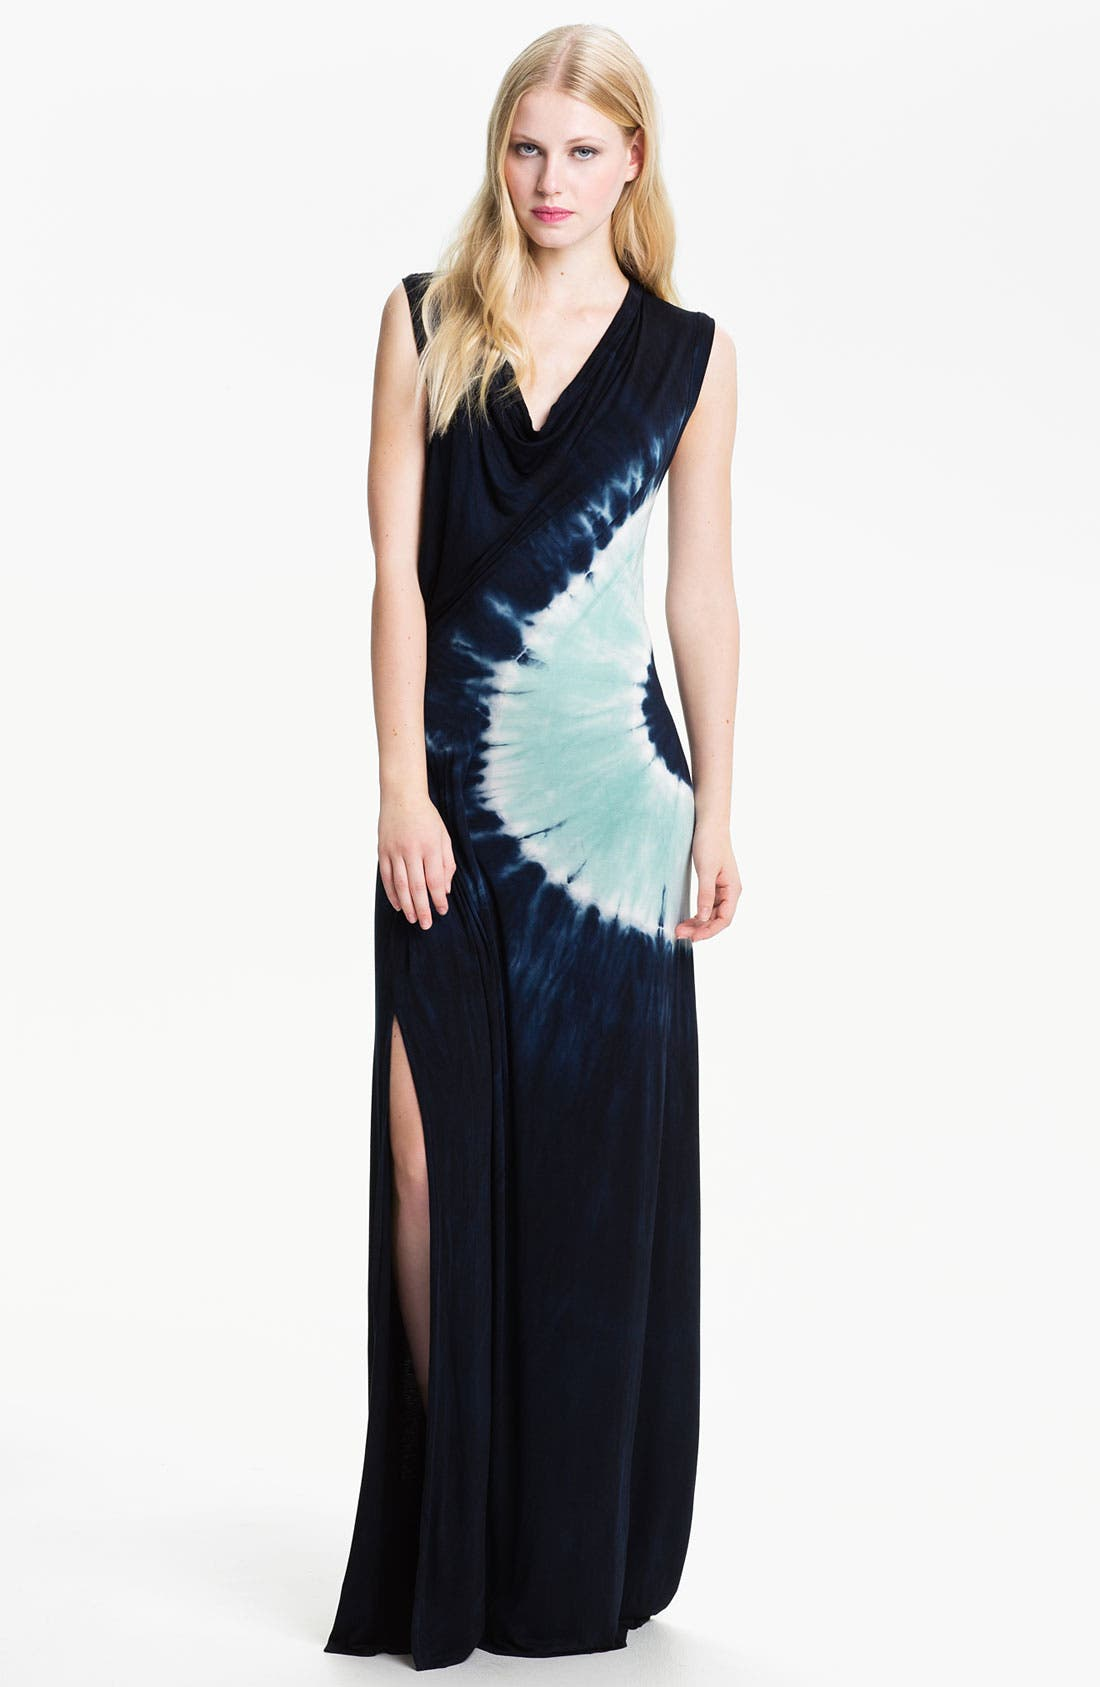 Alternate Image 1 Selected - Young, Fabulous & Broke 'Yoka' Tie Dye Maxi Dress